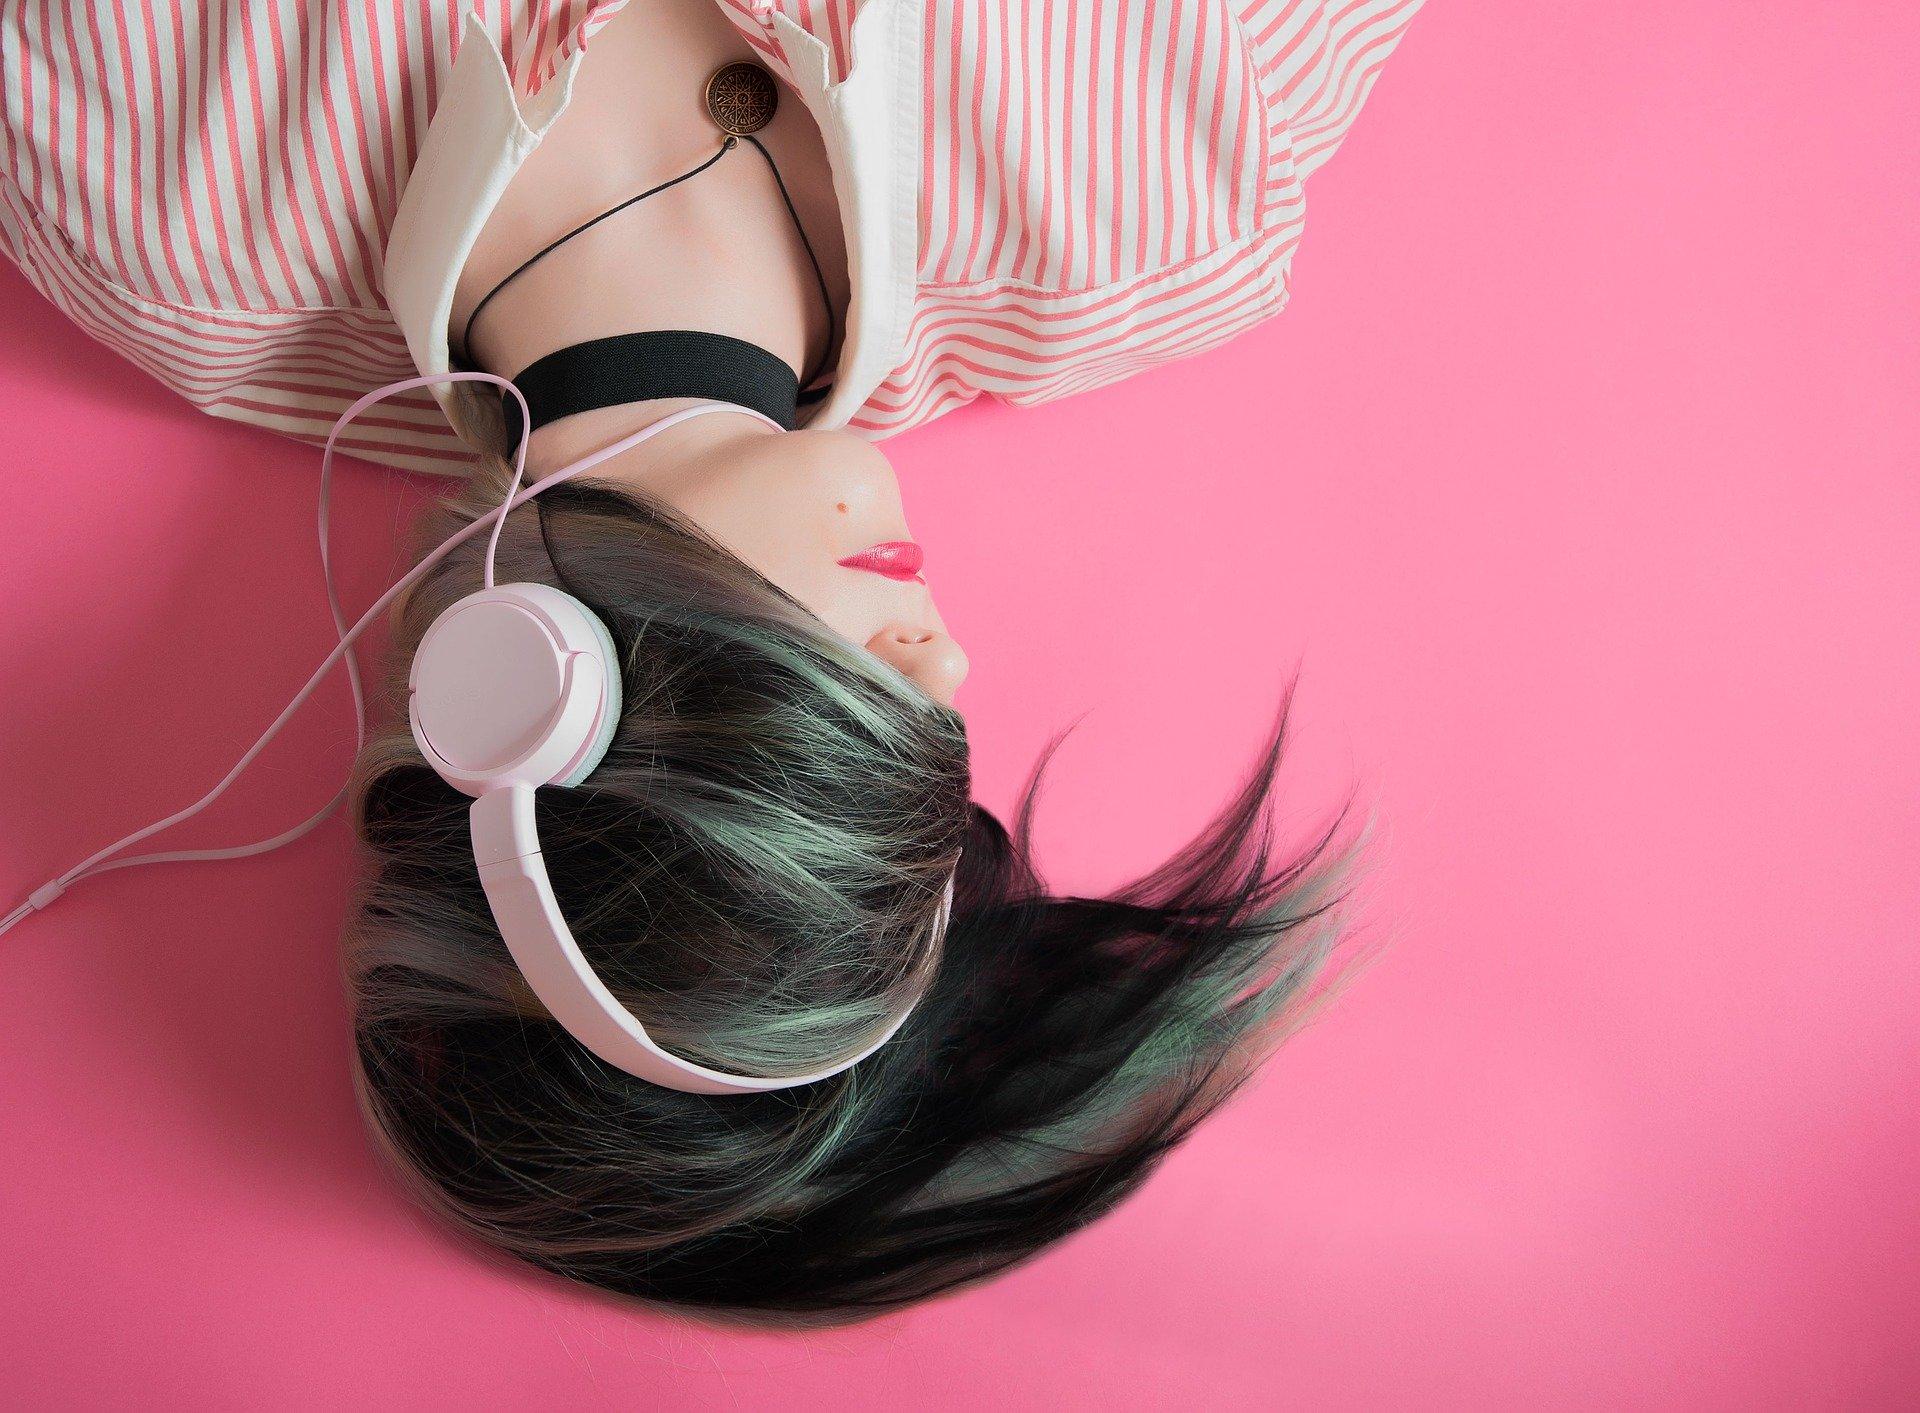 MUSICA IN 8 D